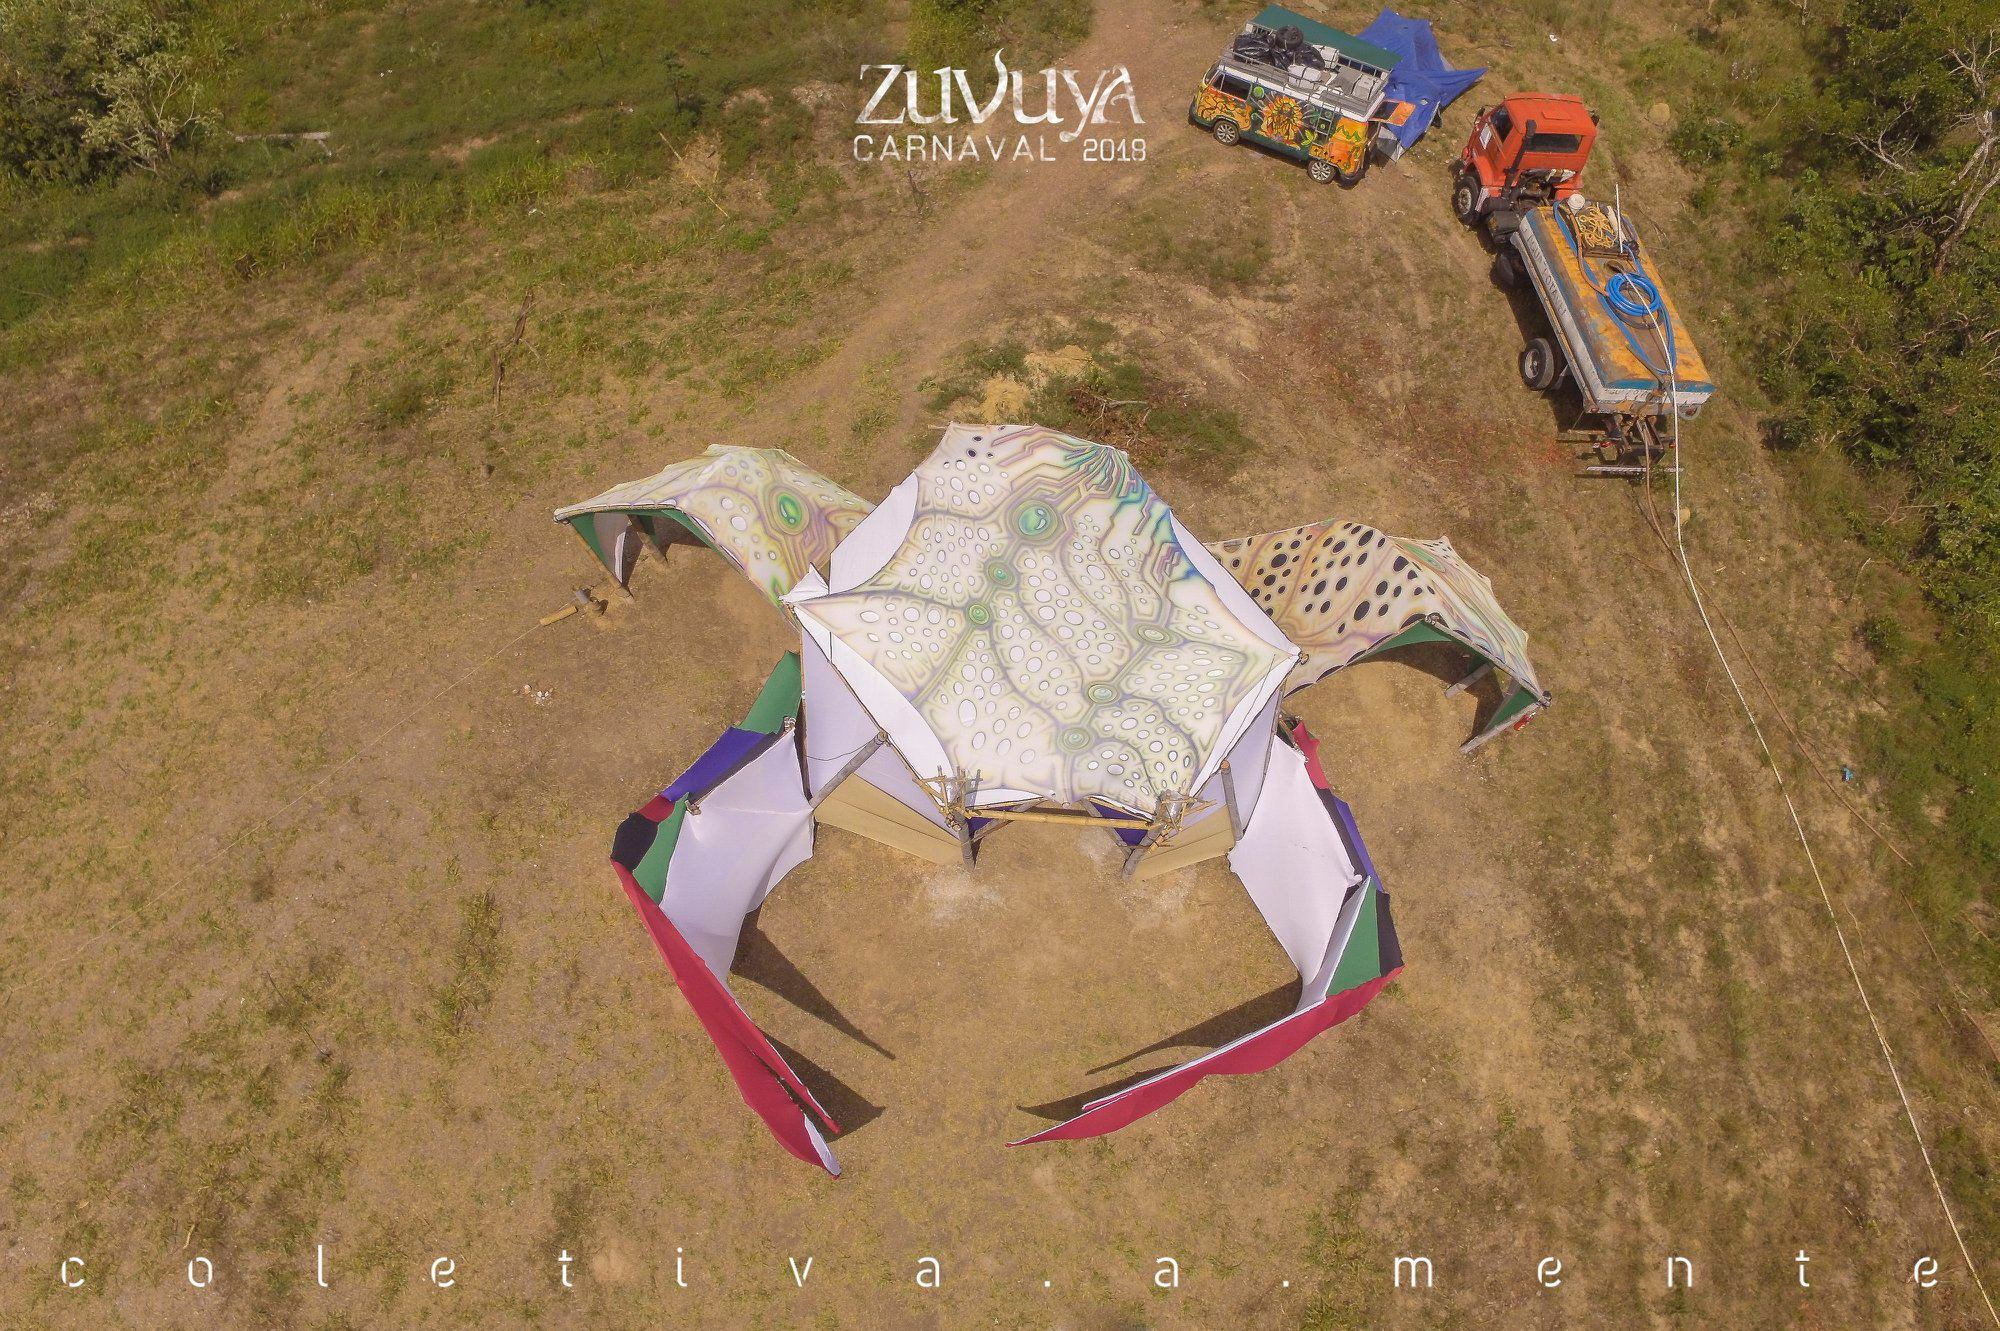 Zuvuya Festival 2018